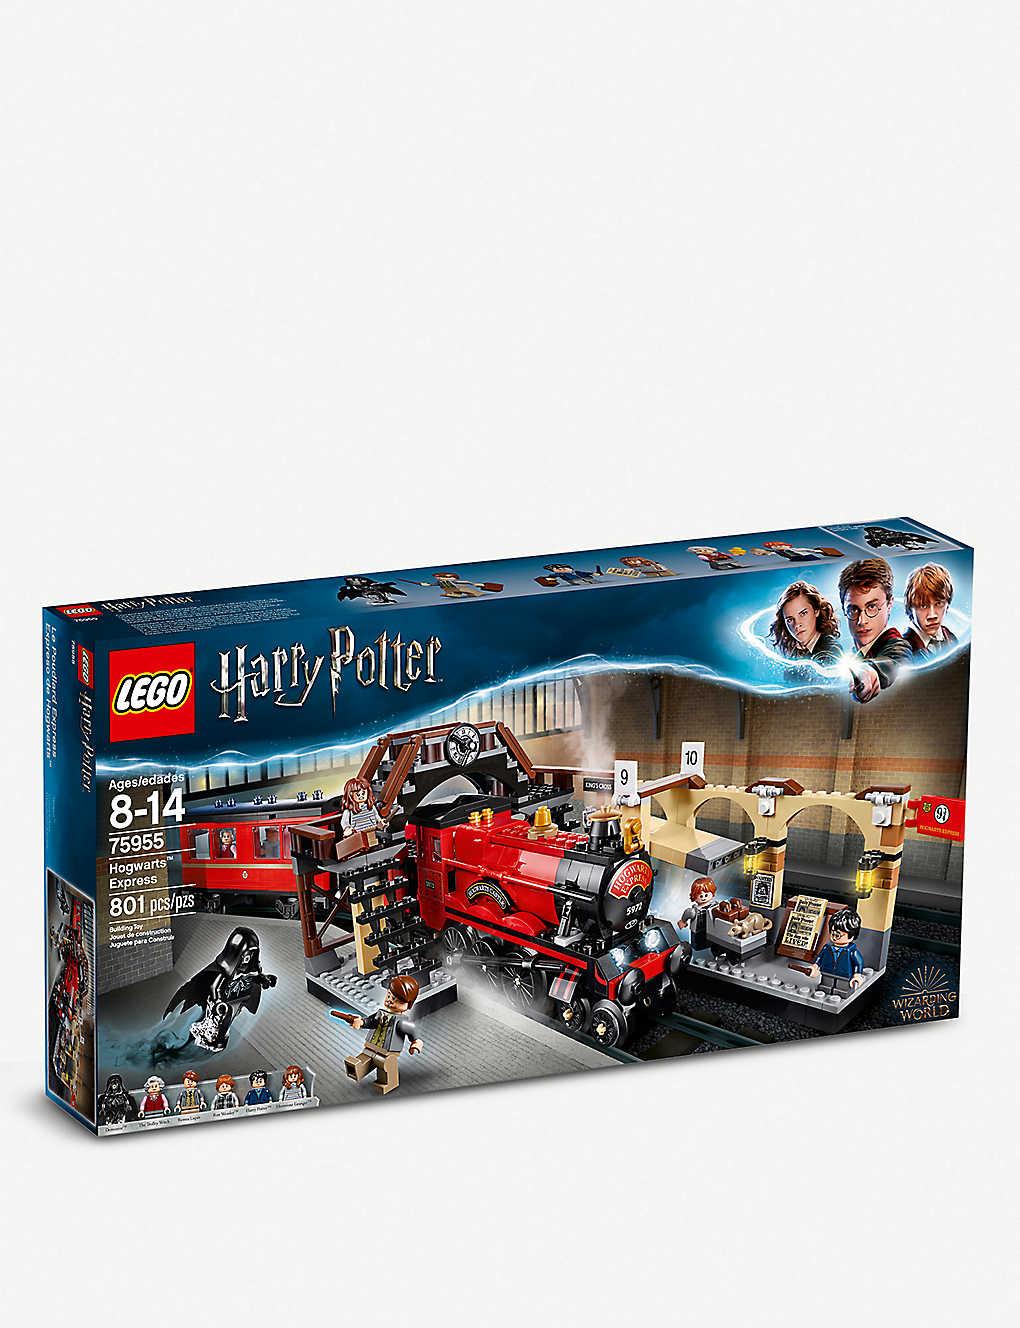 Lego harry potter train set